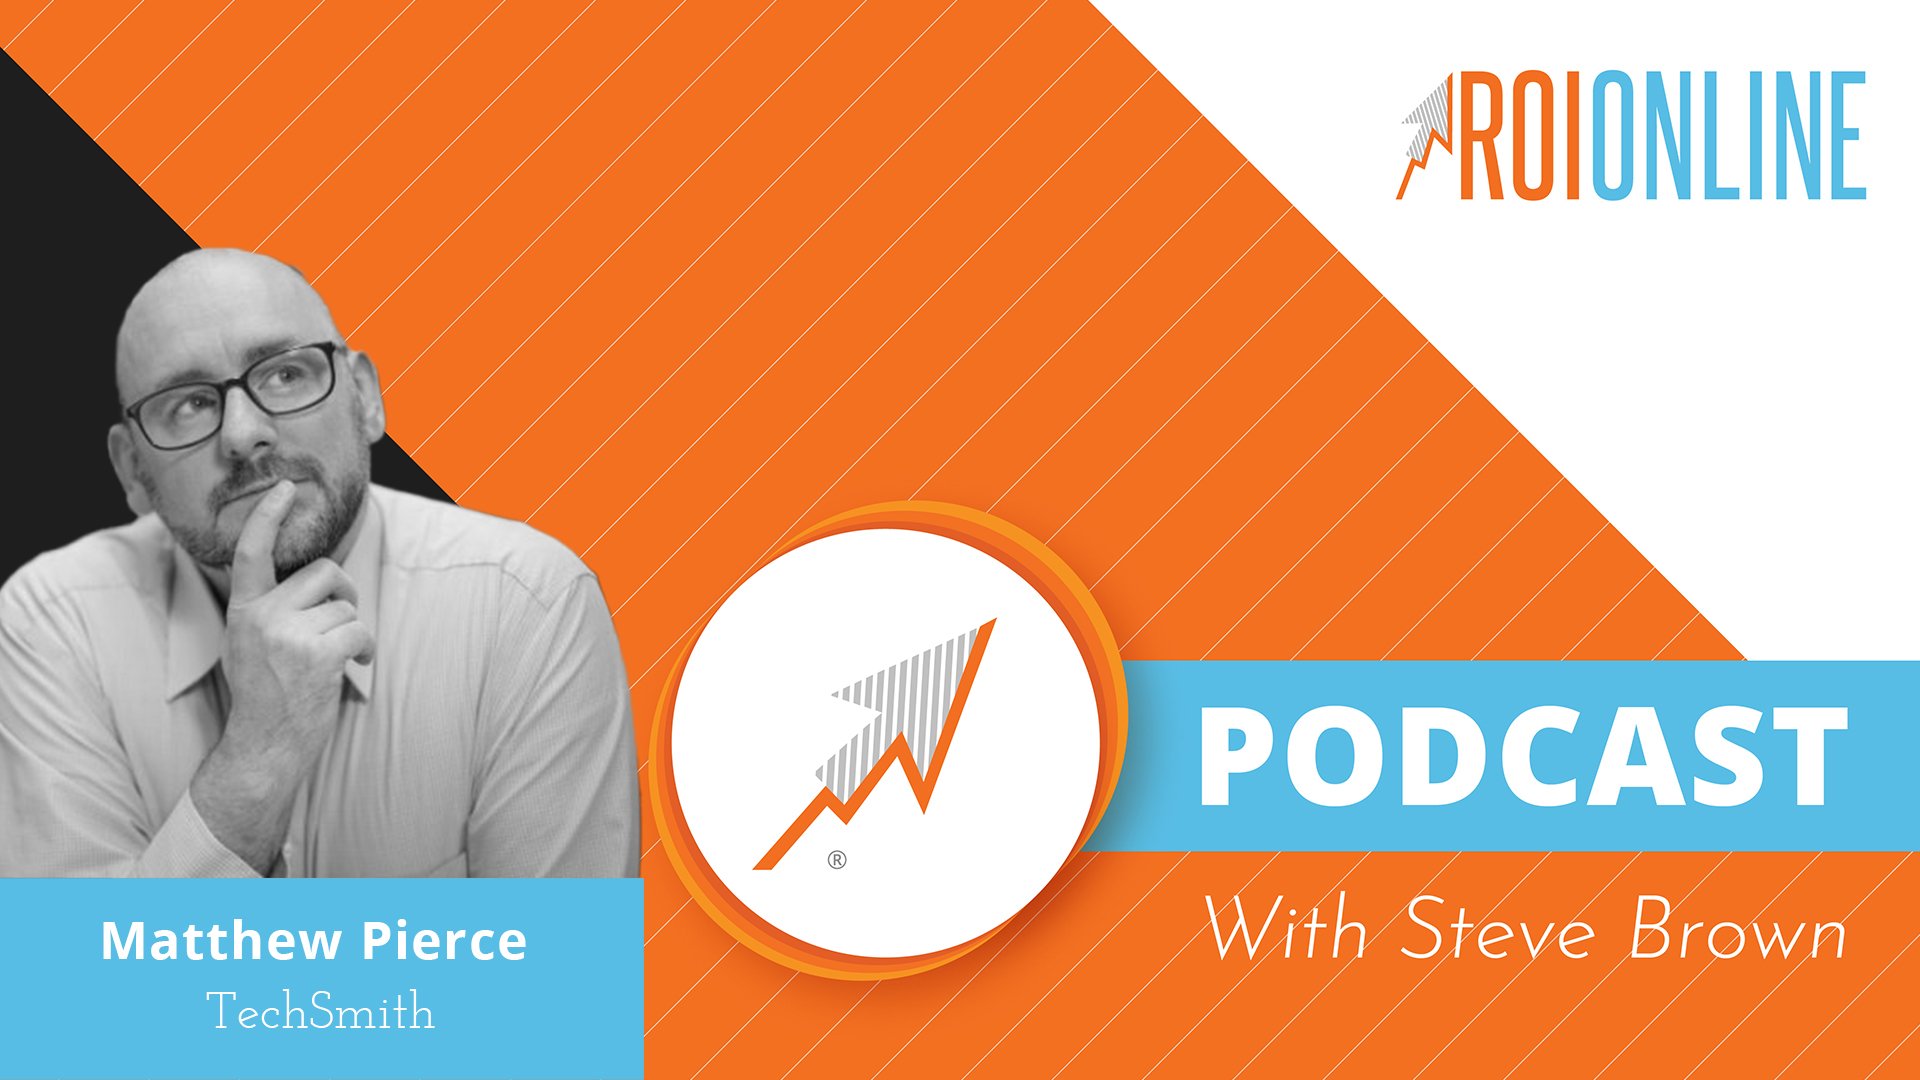 ROI Online Podcast thumbnail graphic of Matthew Pierce